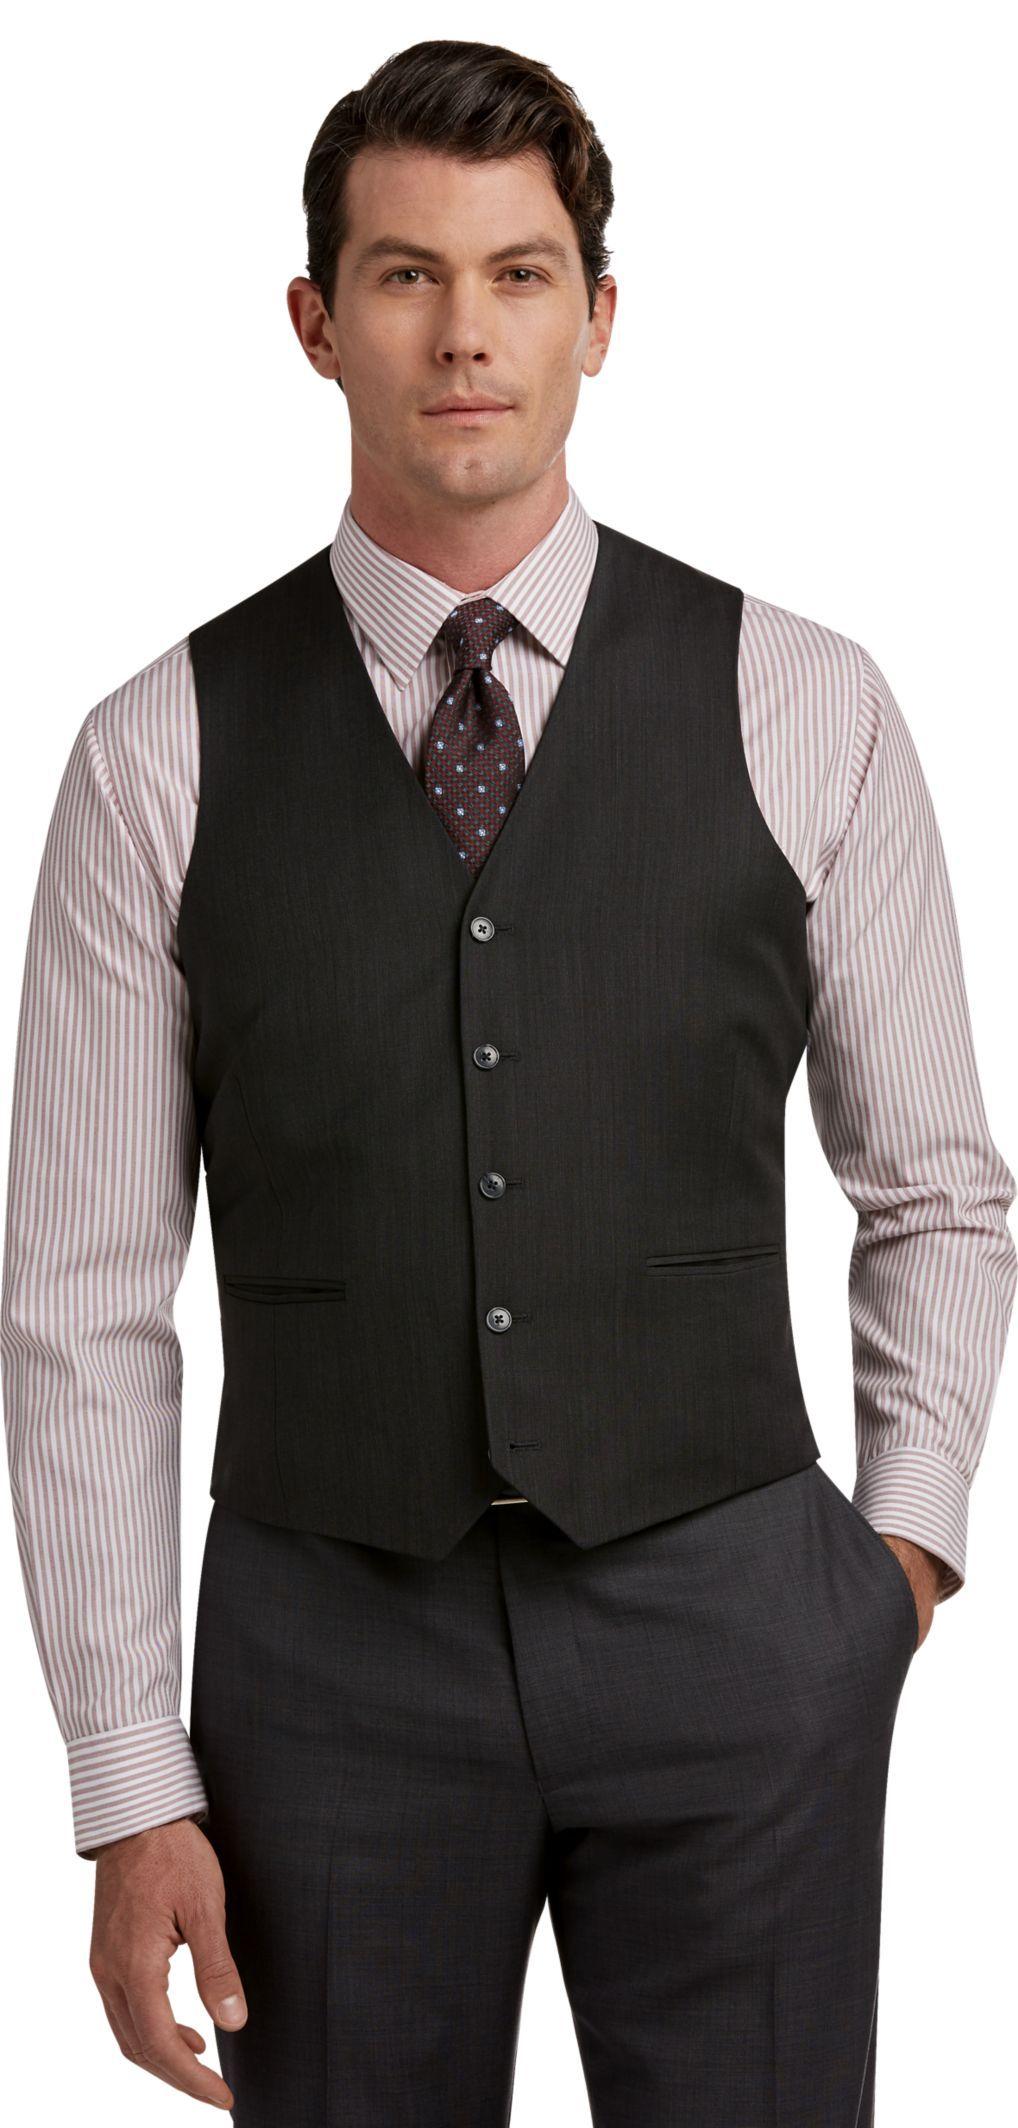 09b62287b21c Traveler Collection Slim Fit Sharkskin Suit Separate Vest | Products ...